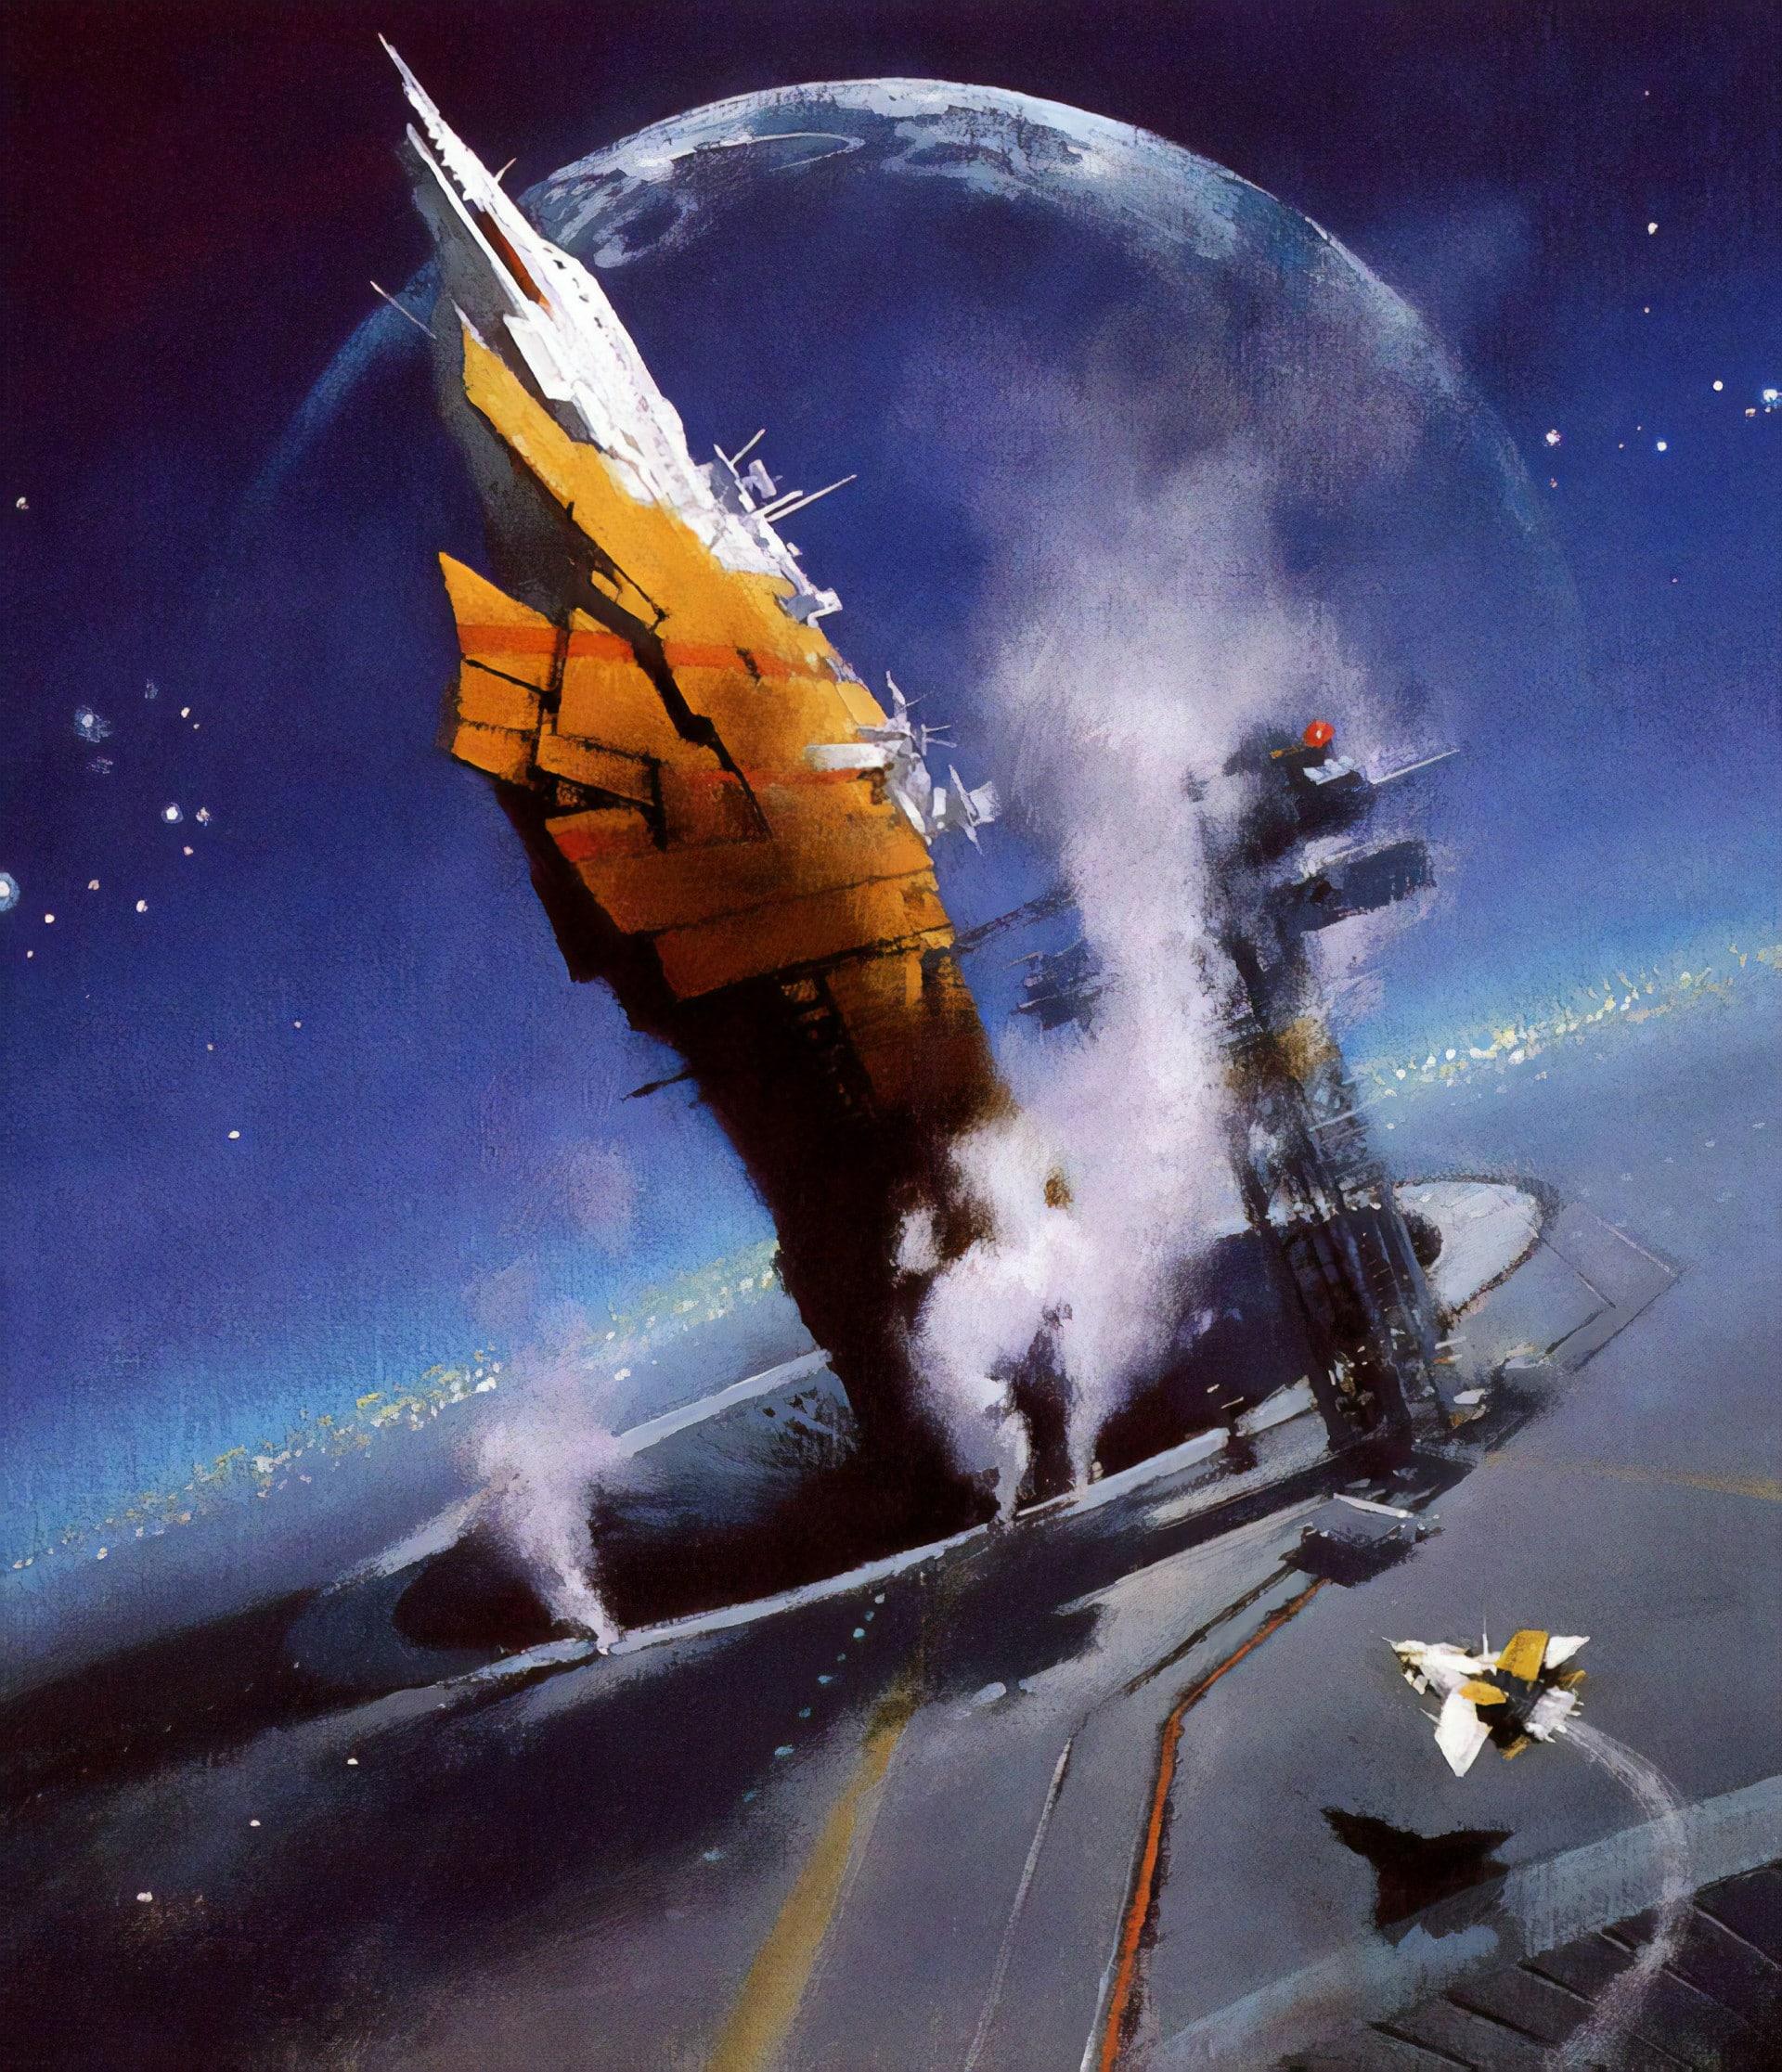 Rentrée gamer : Netrunner & Space Empires 4x Science-fiction-John-Harris-1970-6